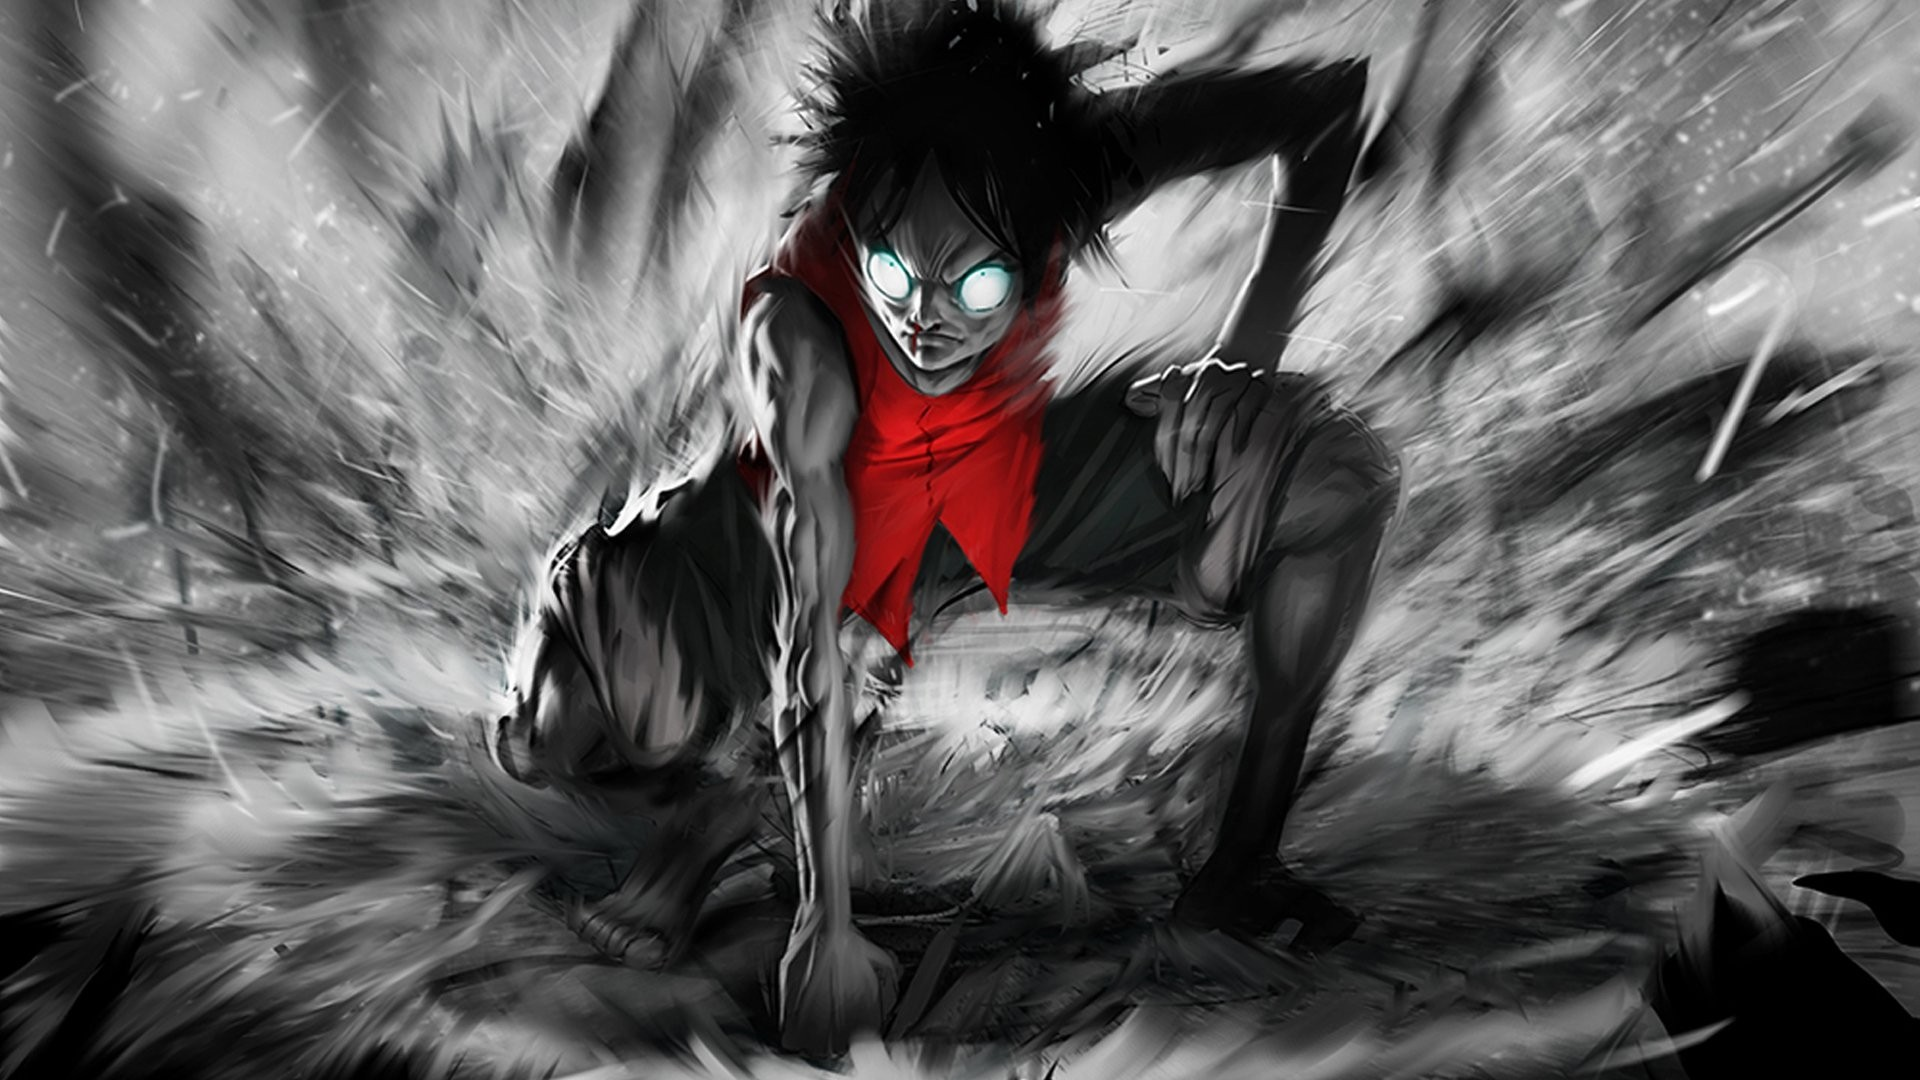 Best Anime Wallpaper Hd Hd Wallpaper X Imagen